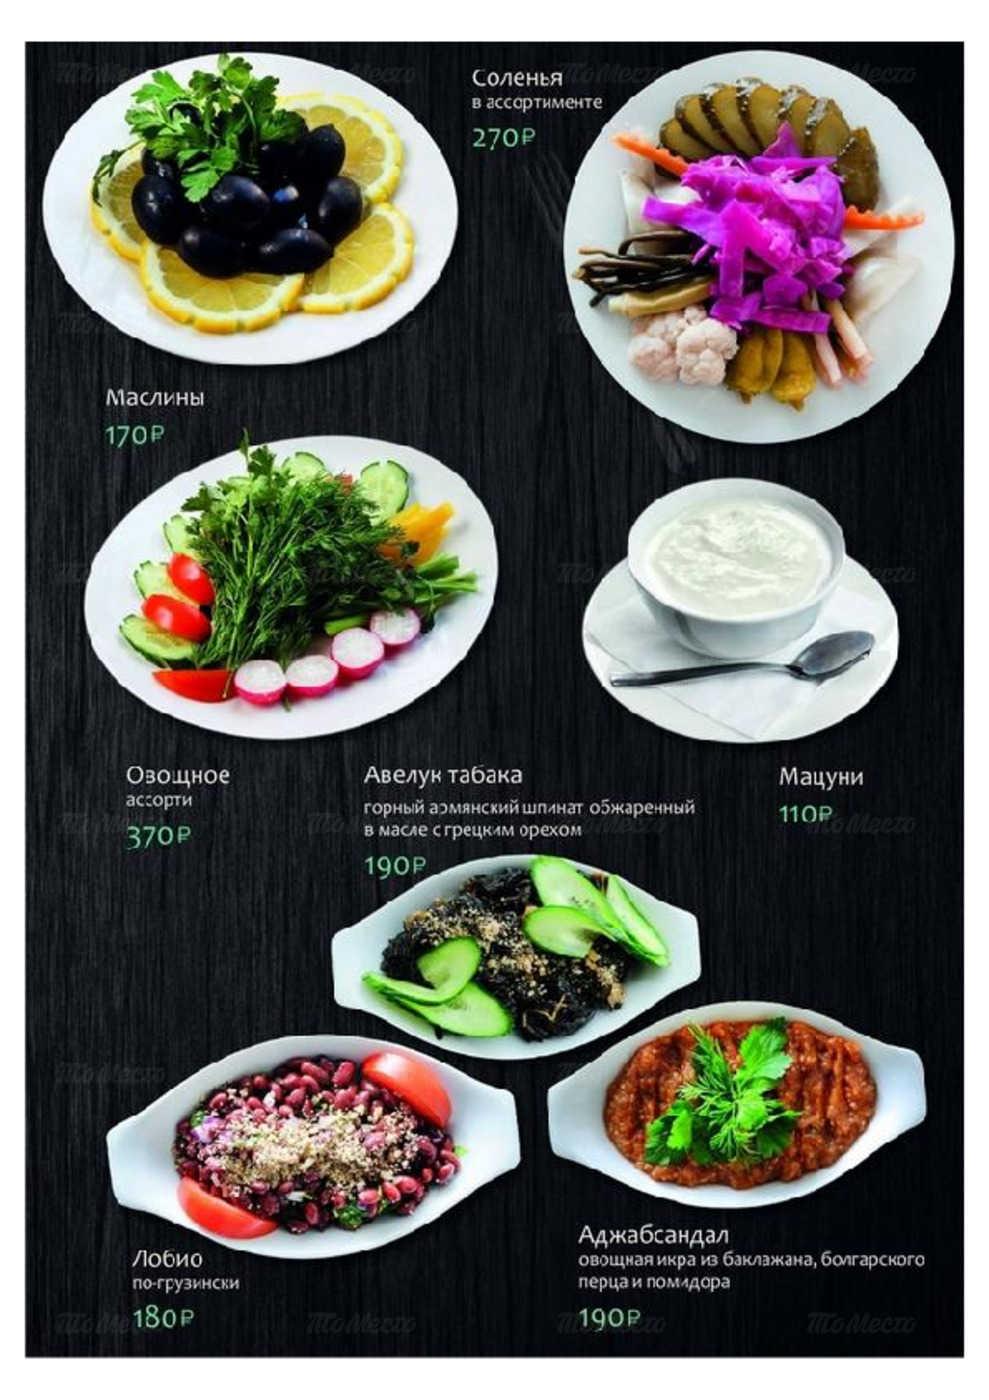 Меню ресторана Любимый Хабиб на проспекте Стачек фото 8